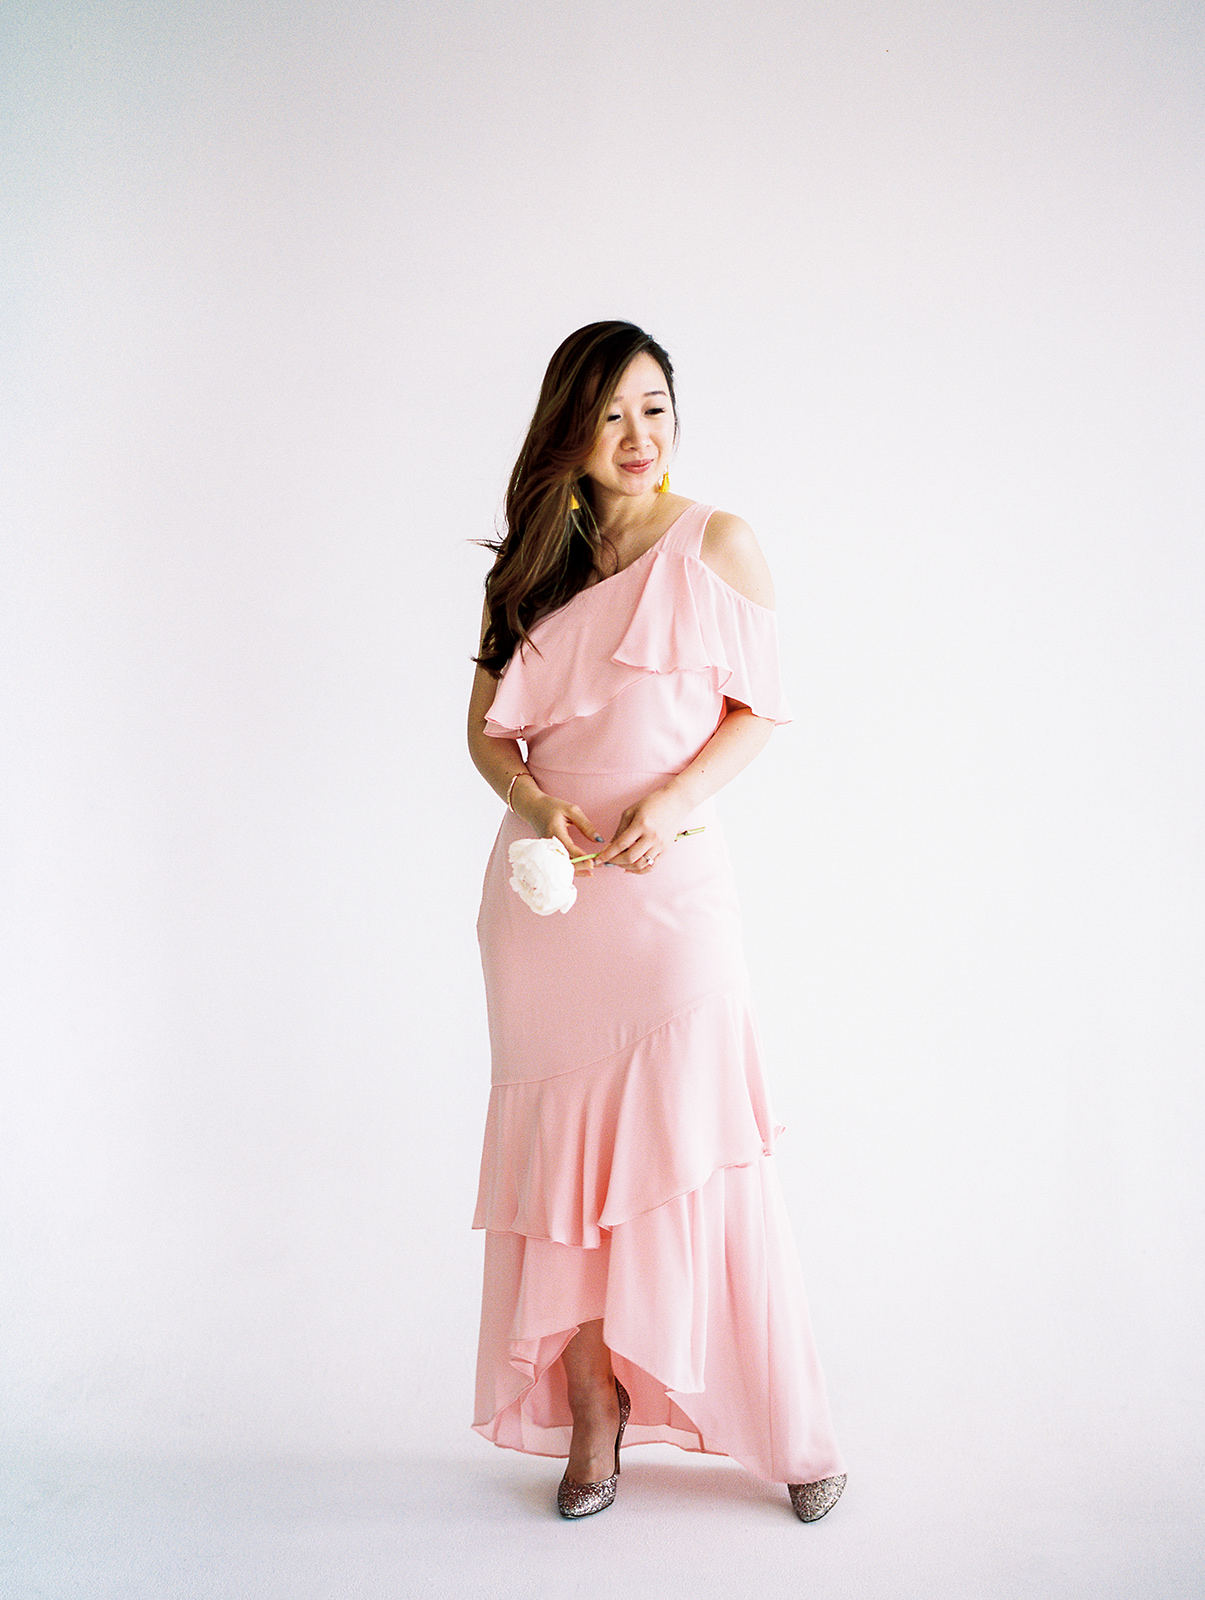 Dress: Parker; Photo by  Kylee Yee .